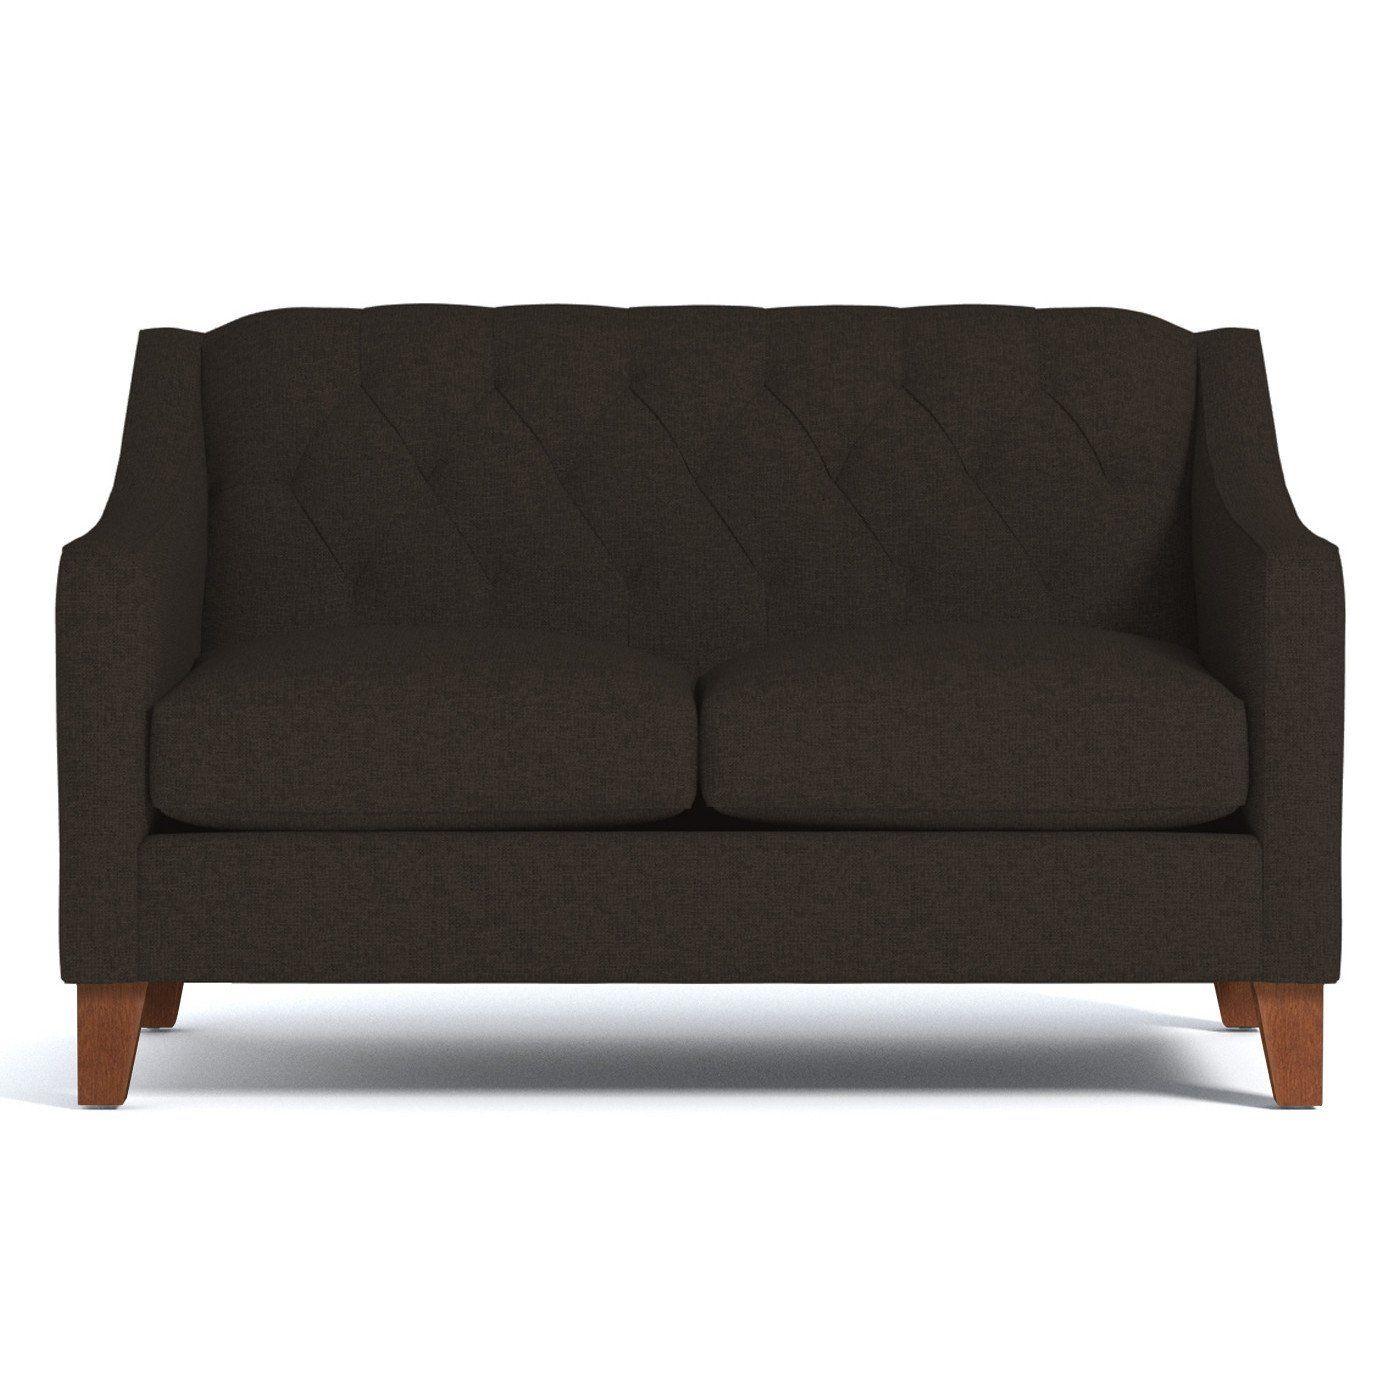 Jackson Apartment Size Sofa From Kyle Schuneman CHOICE OF FABRICS